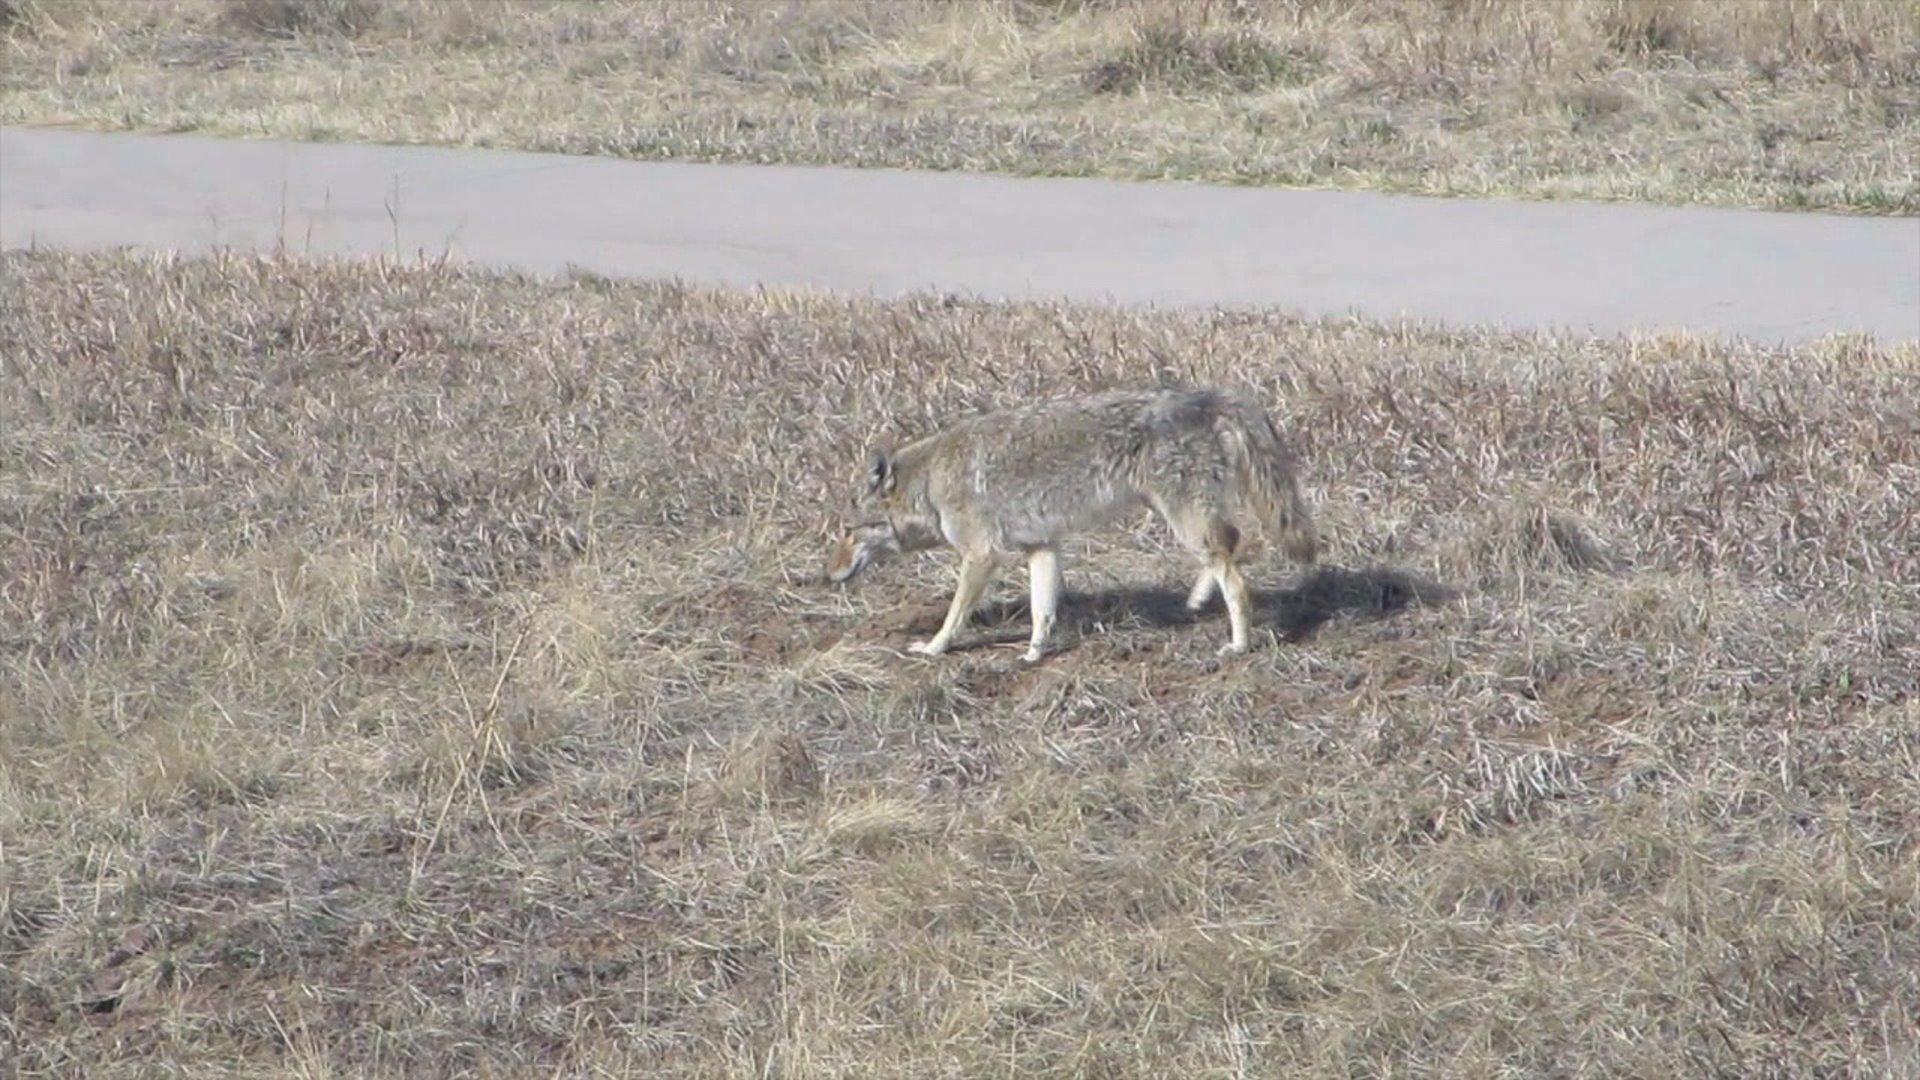 Coyote in Highlands Ranch neighborhood